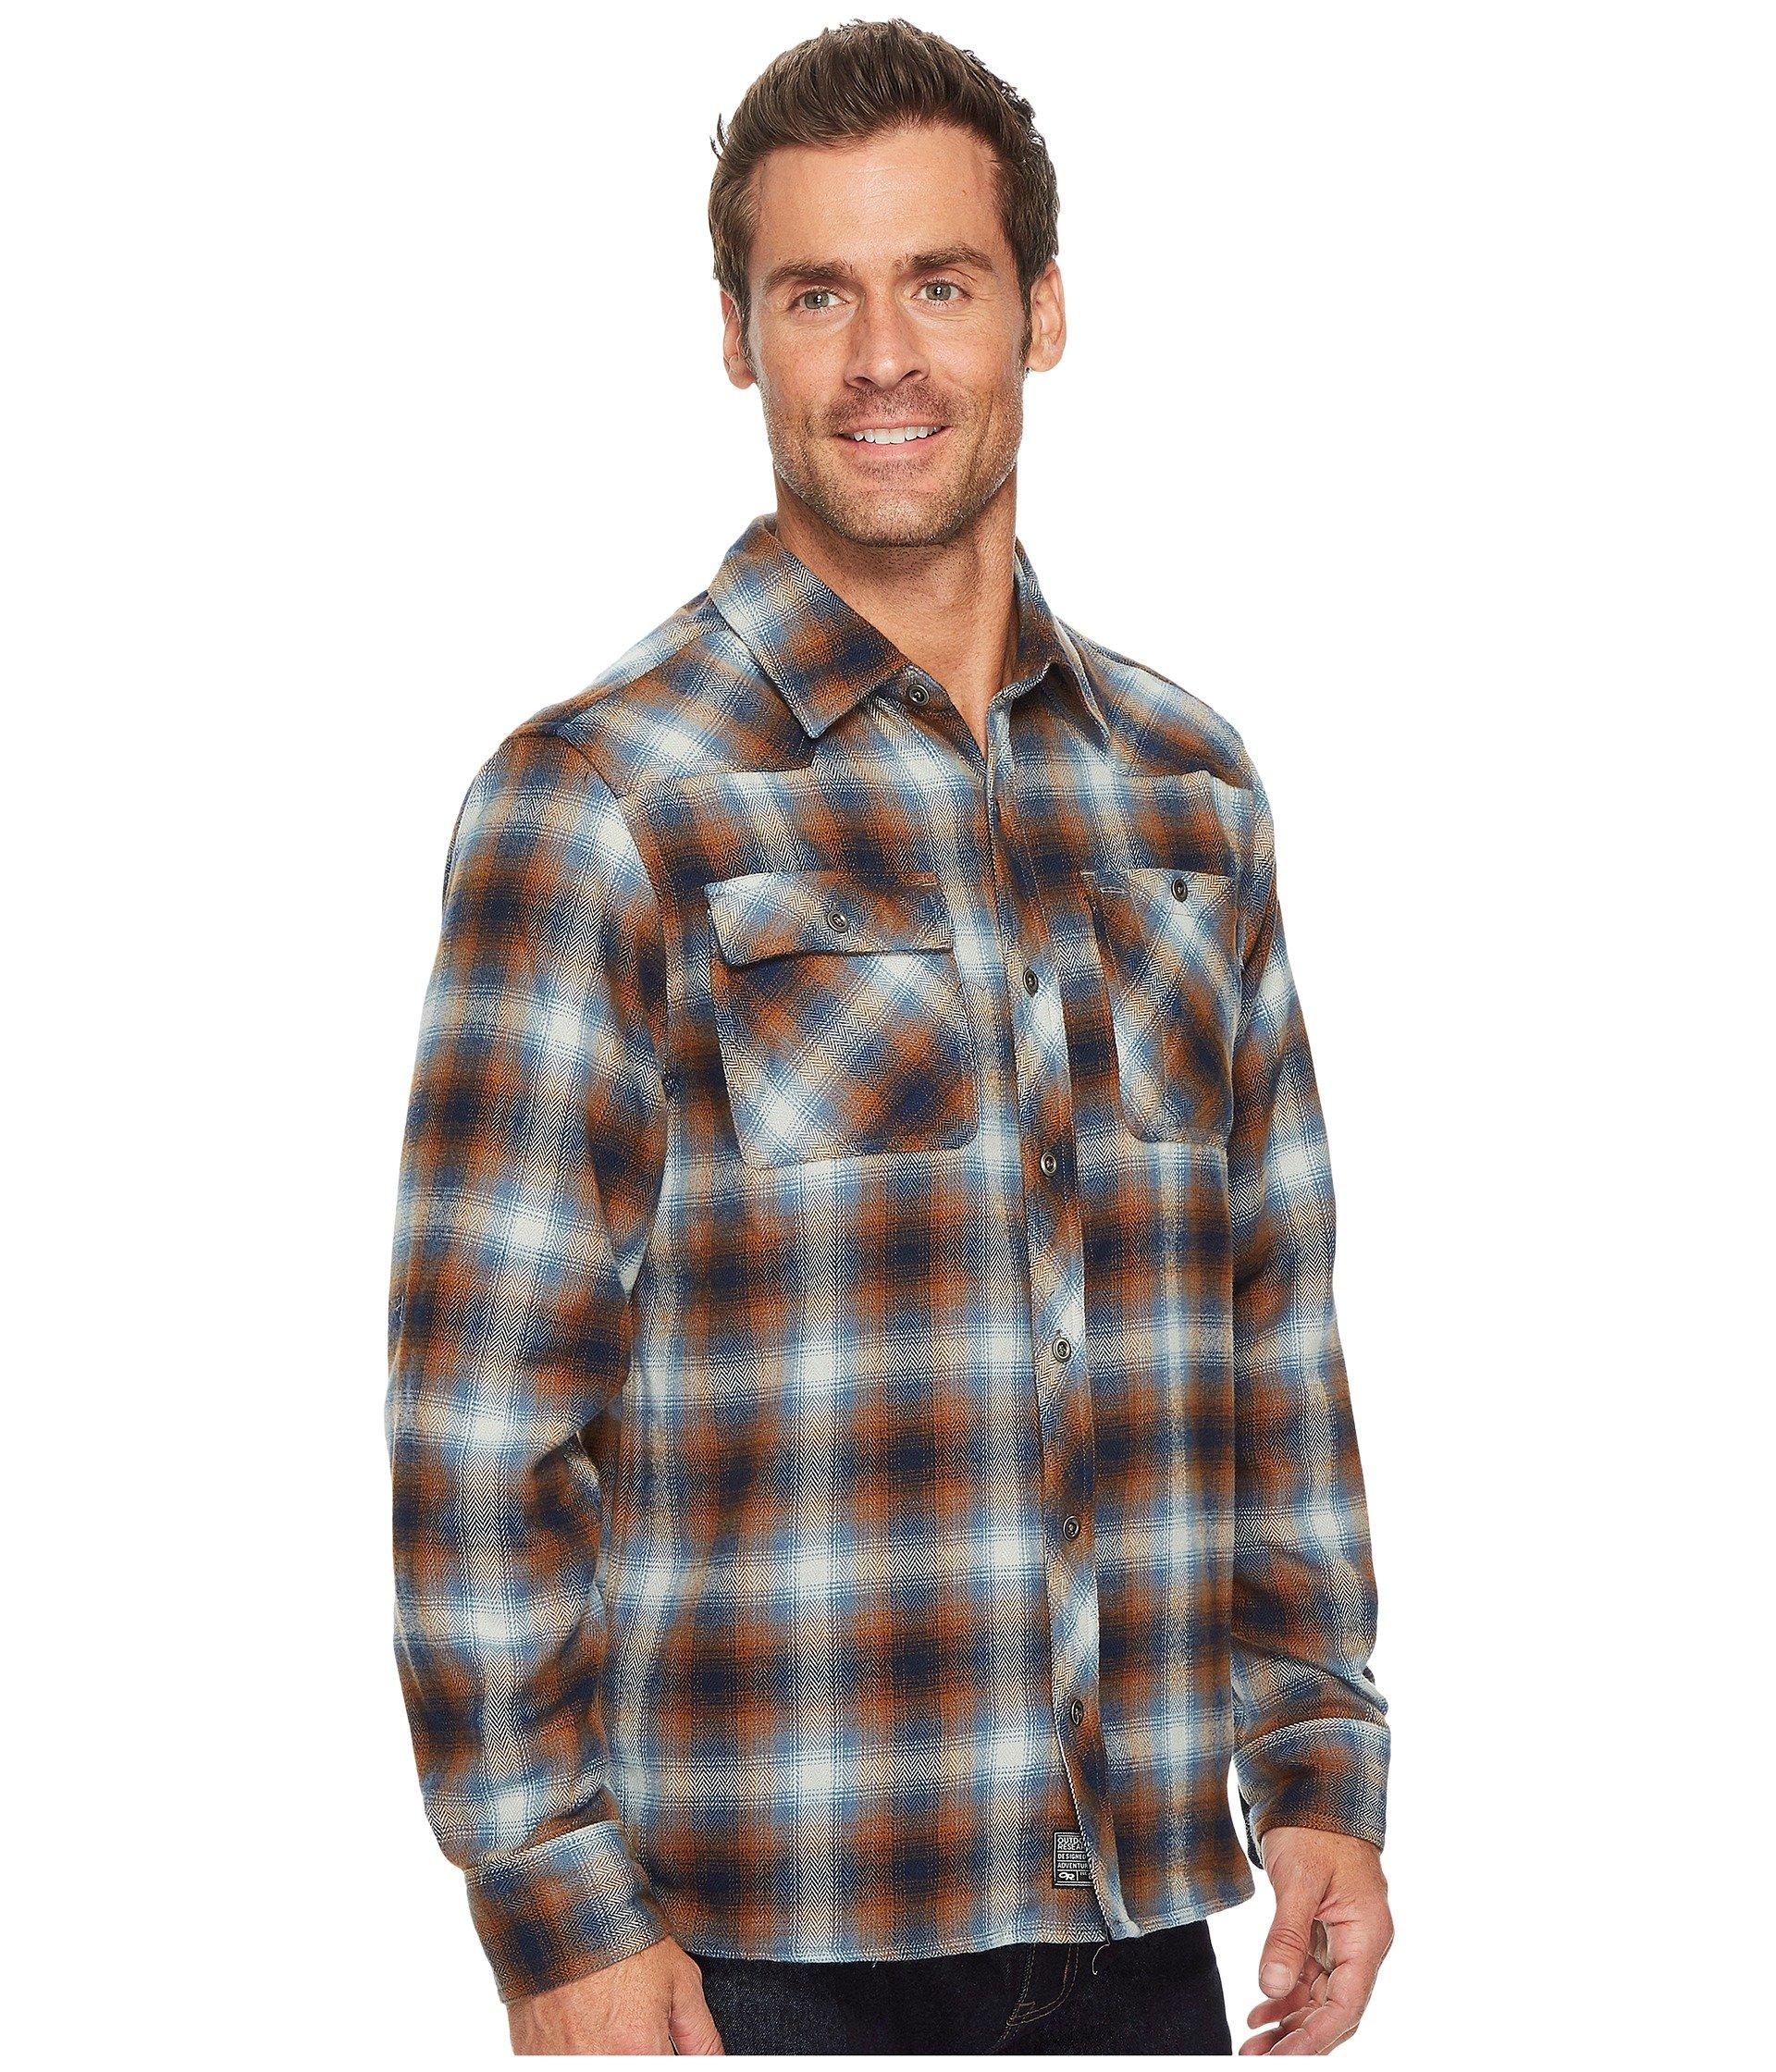 Outdoor Research Shirt™ Night Flannel Feedback saddle qSrwqHB